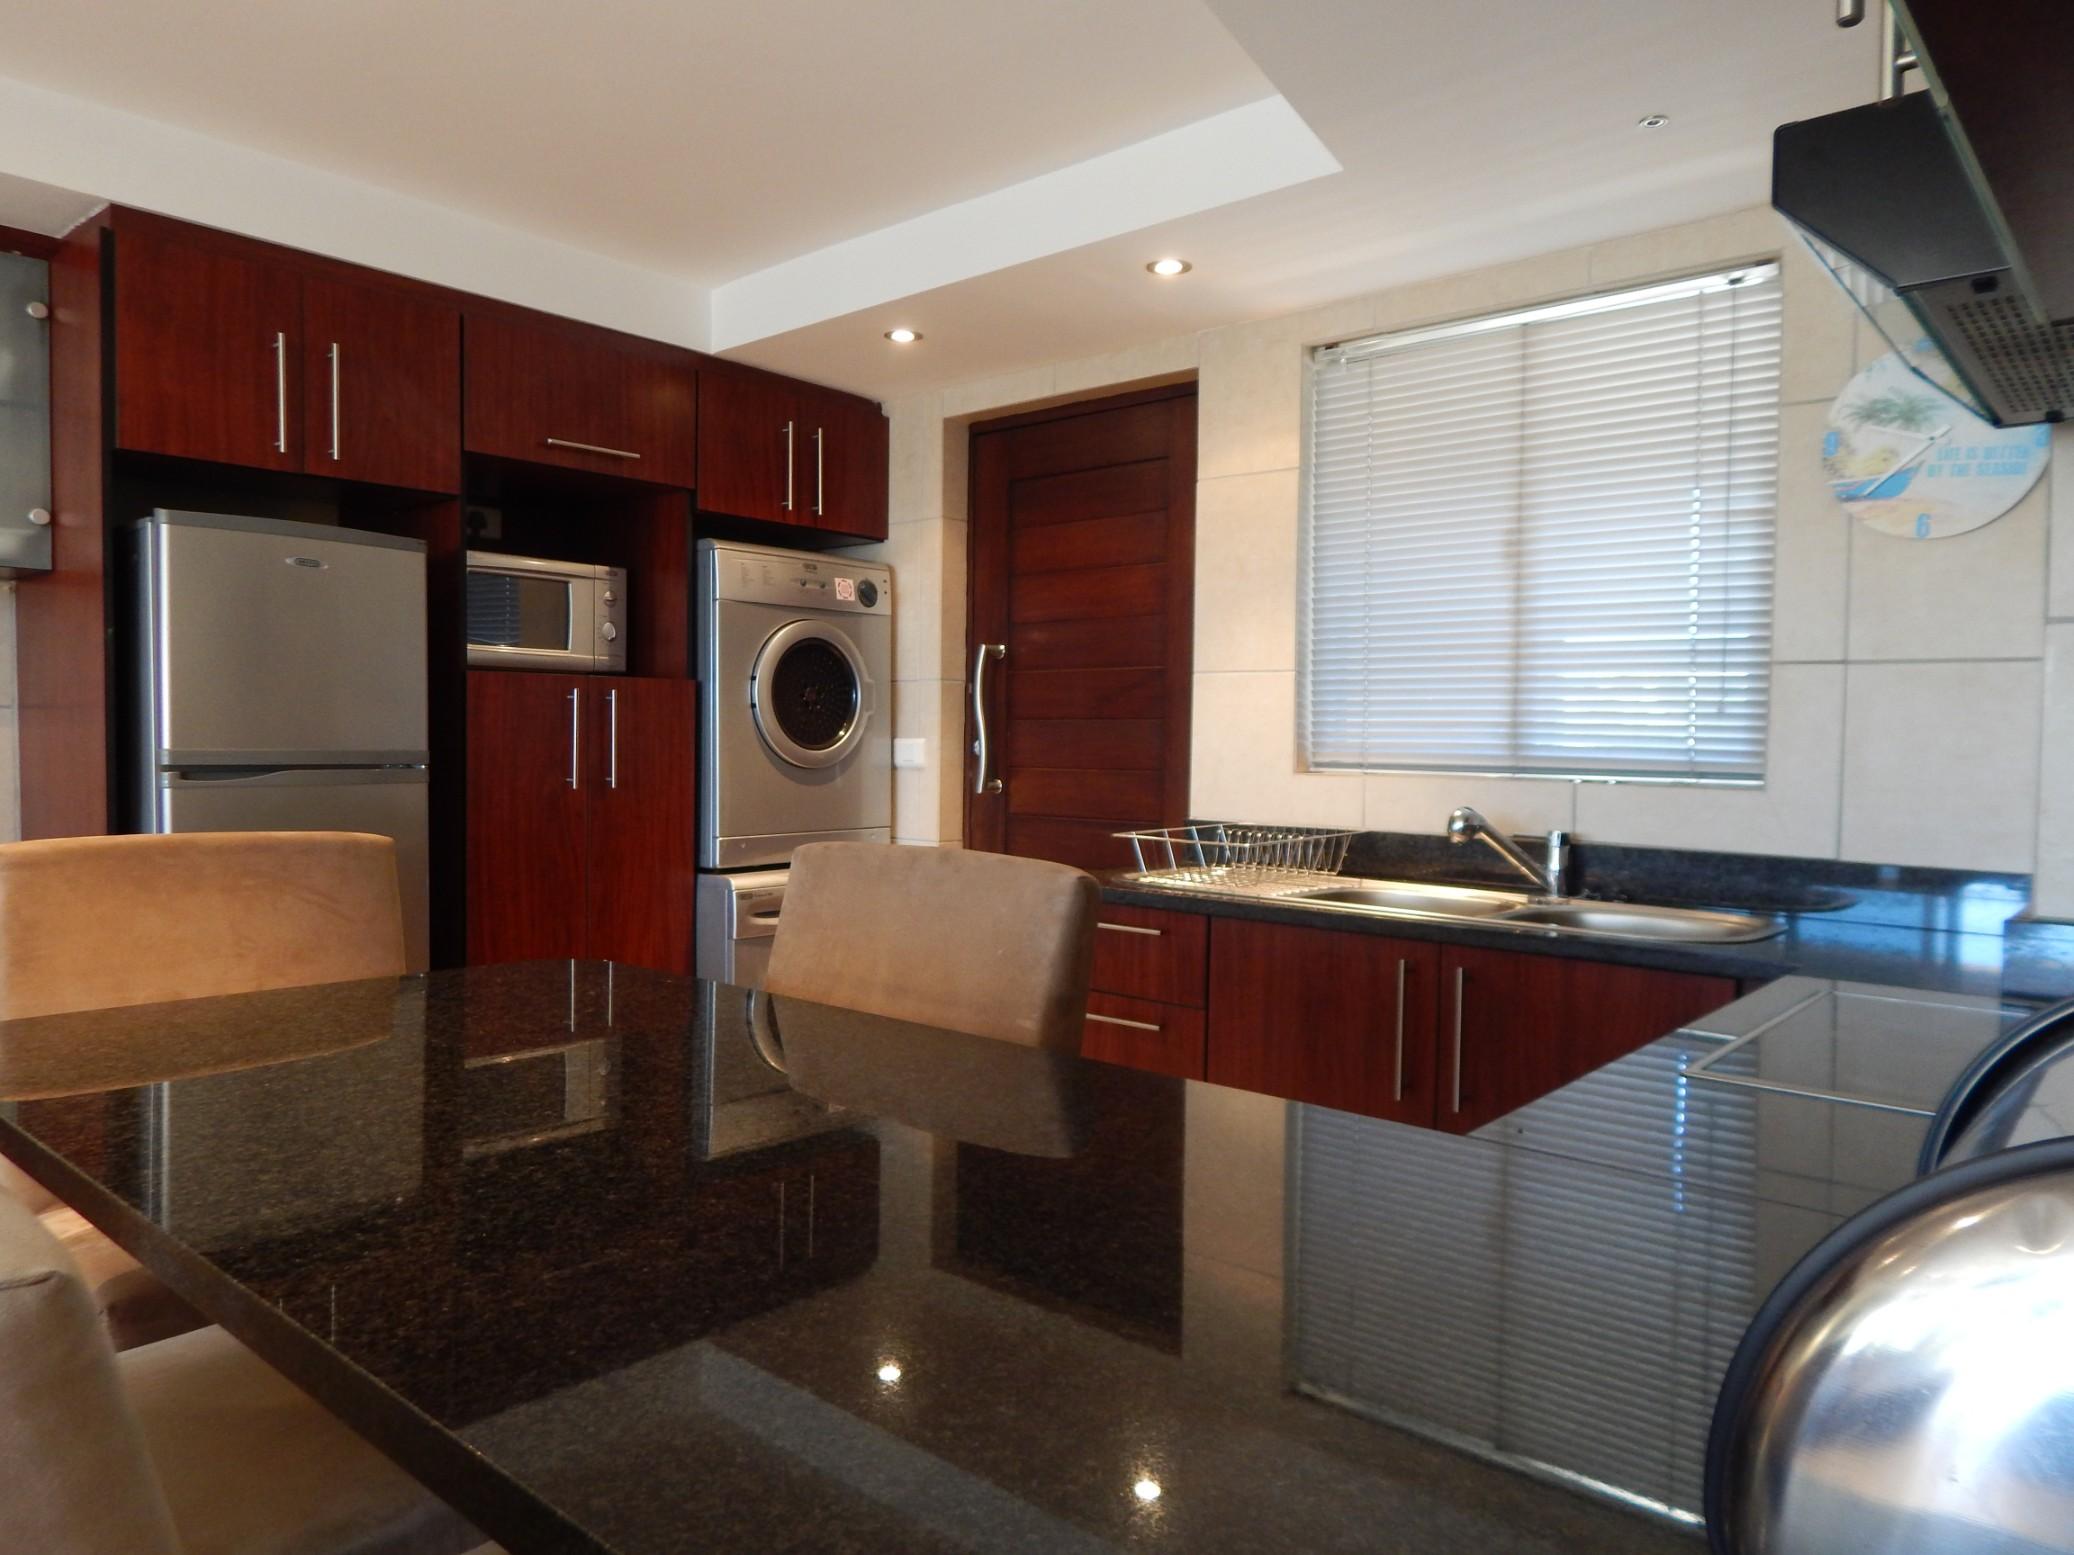 2 Bedroom Apartment for sale in De Bakke ENT0067862 : photo#13